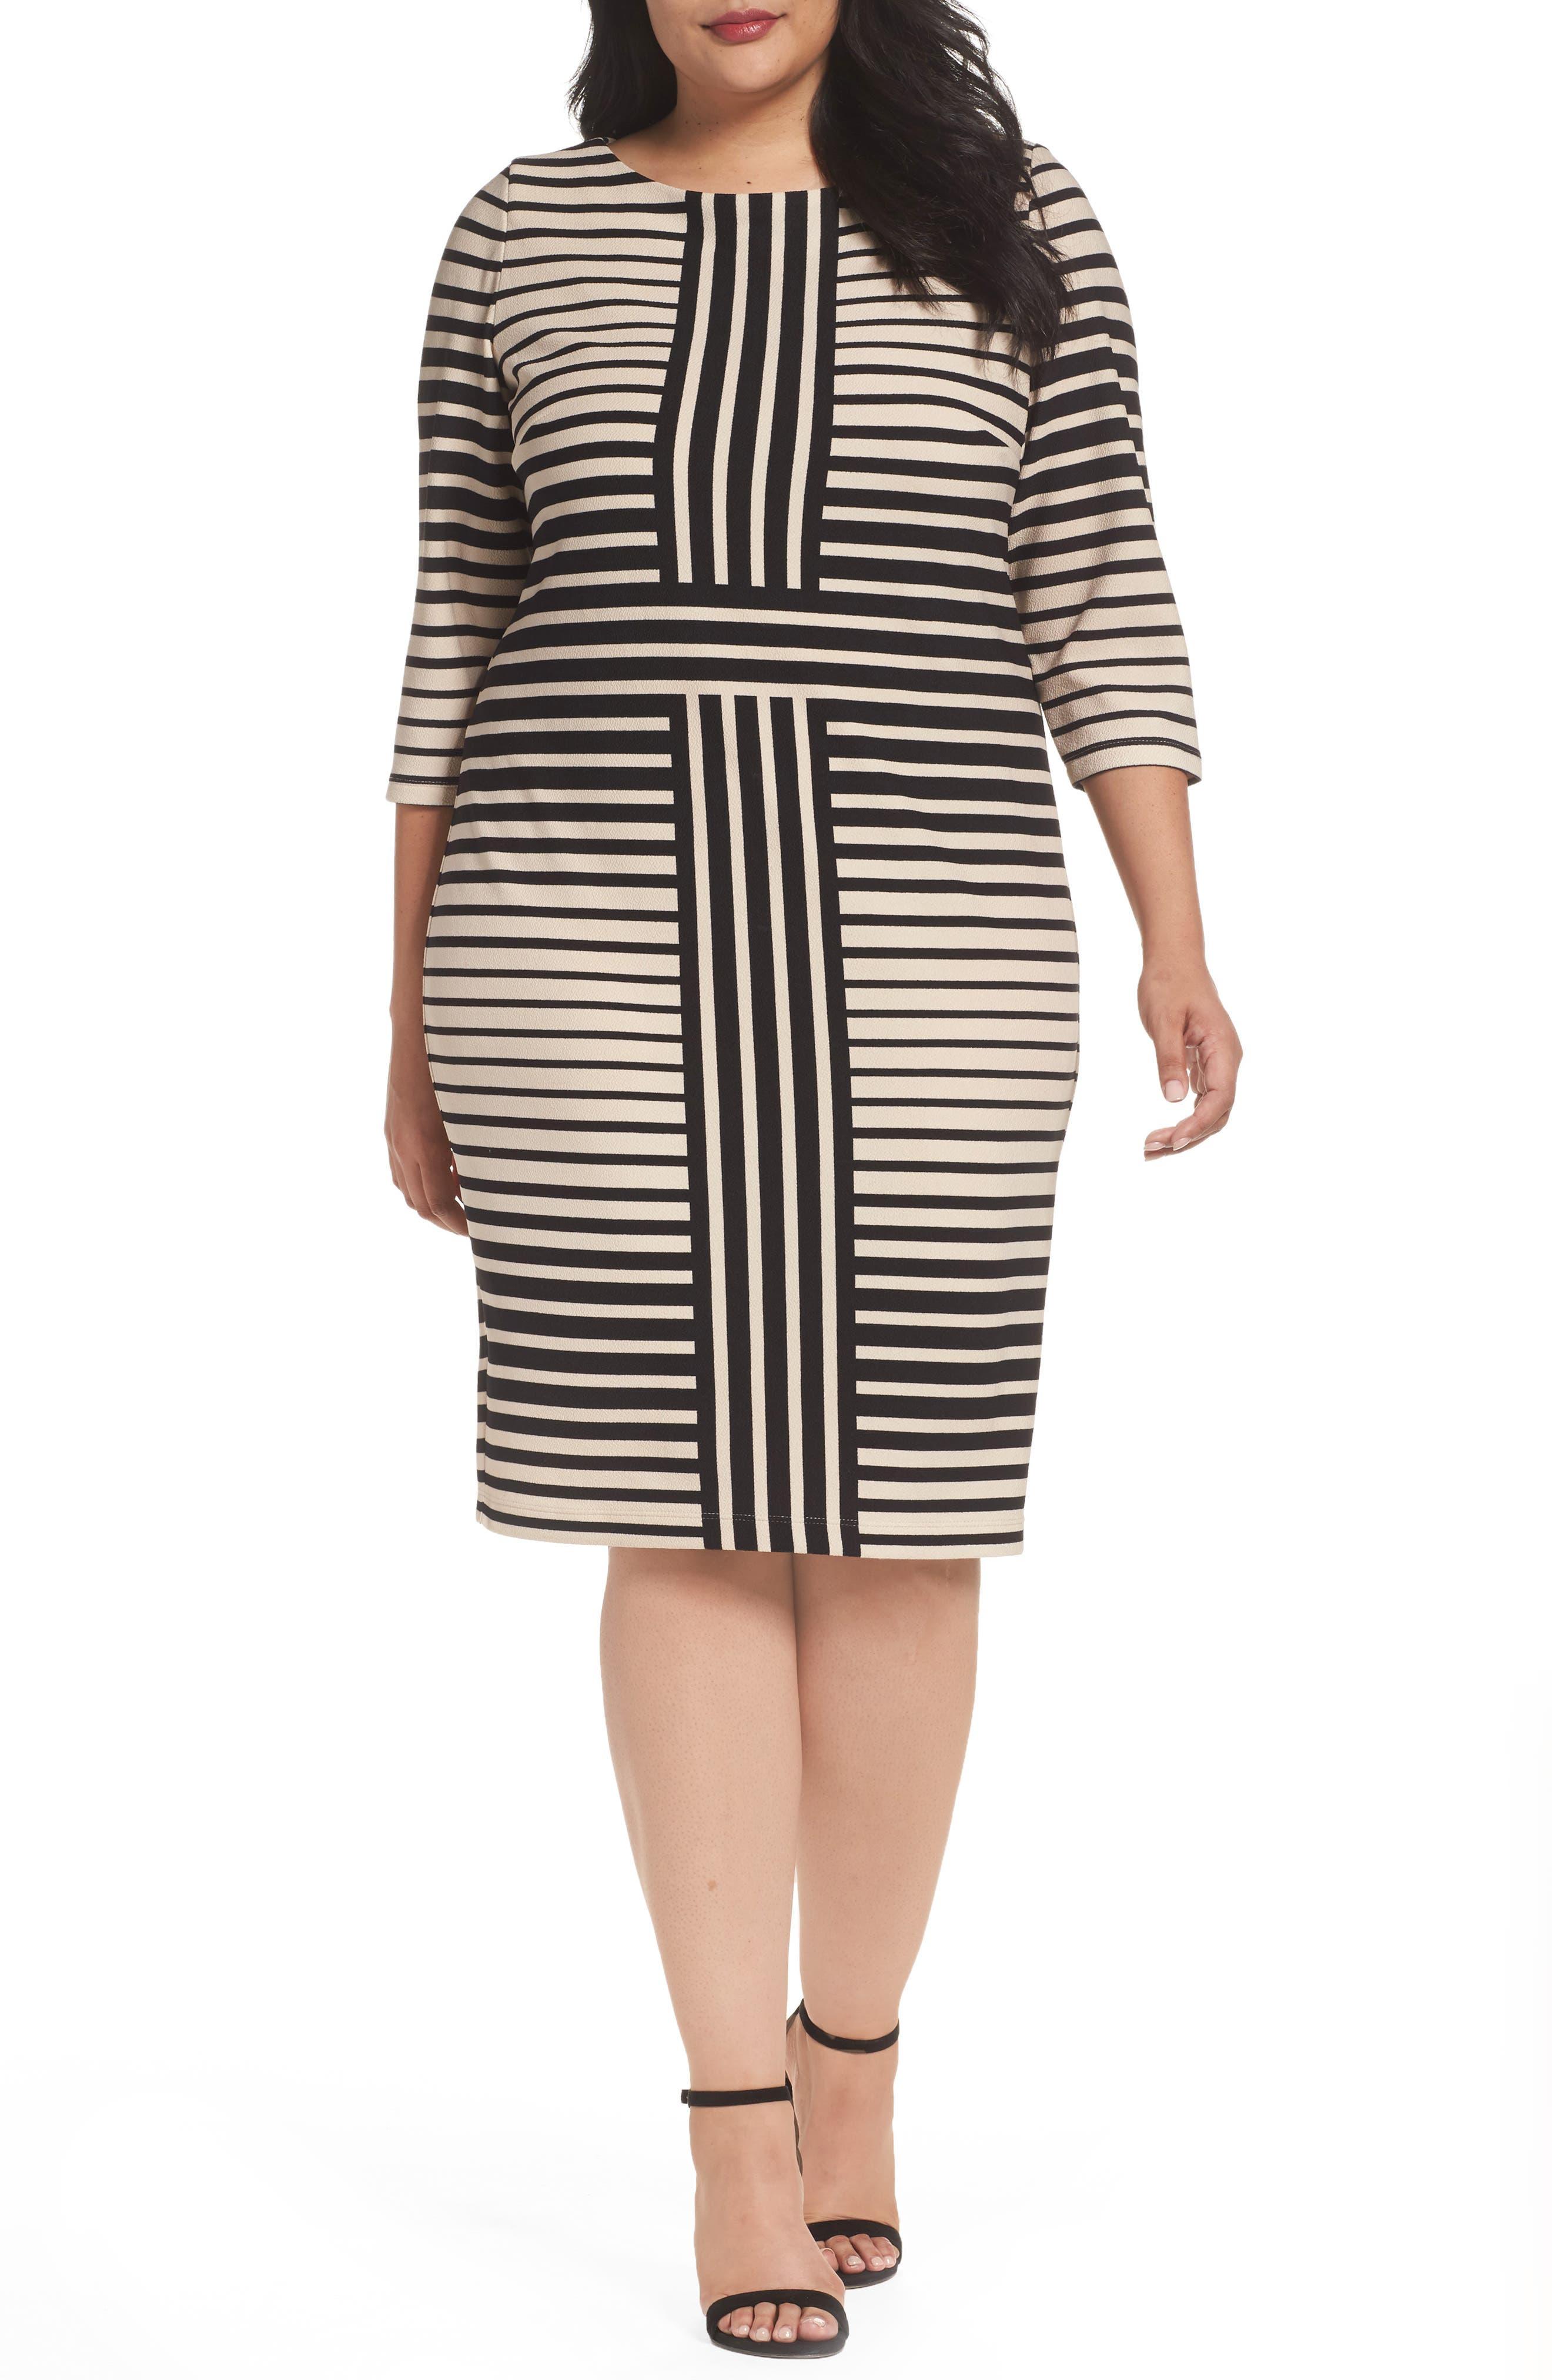 Alternate Image 1 Selected - Gabby Skye Stripe Knit Sheath Dress (Plus Size)